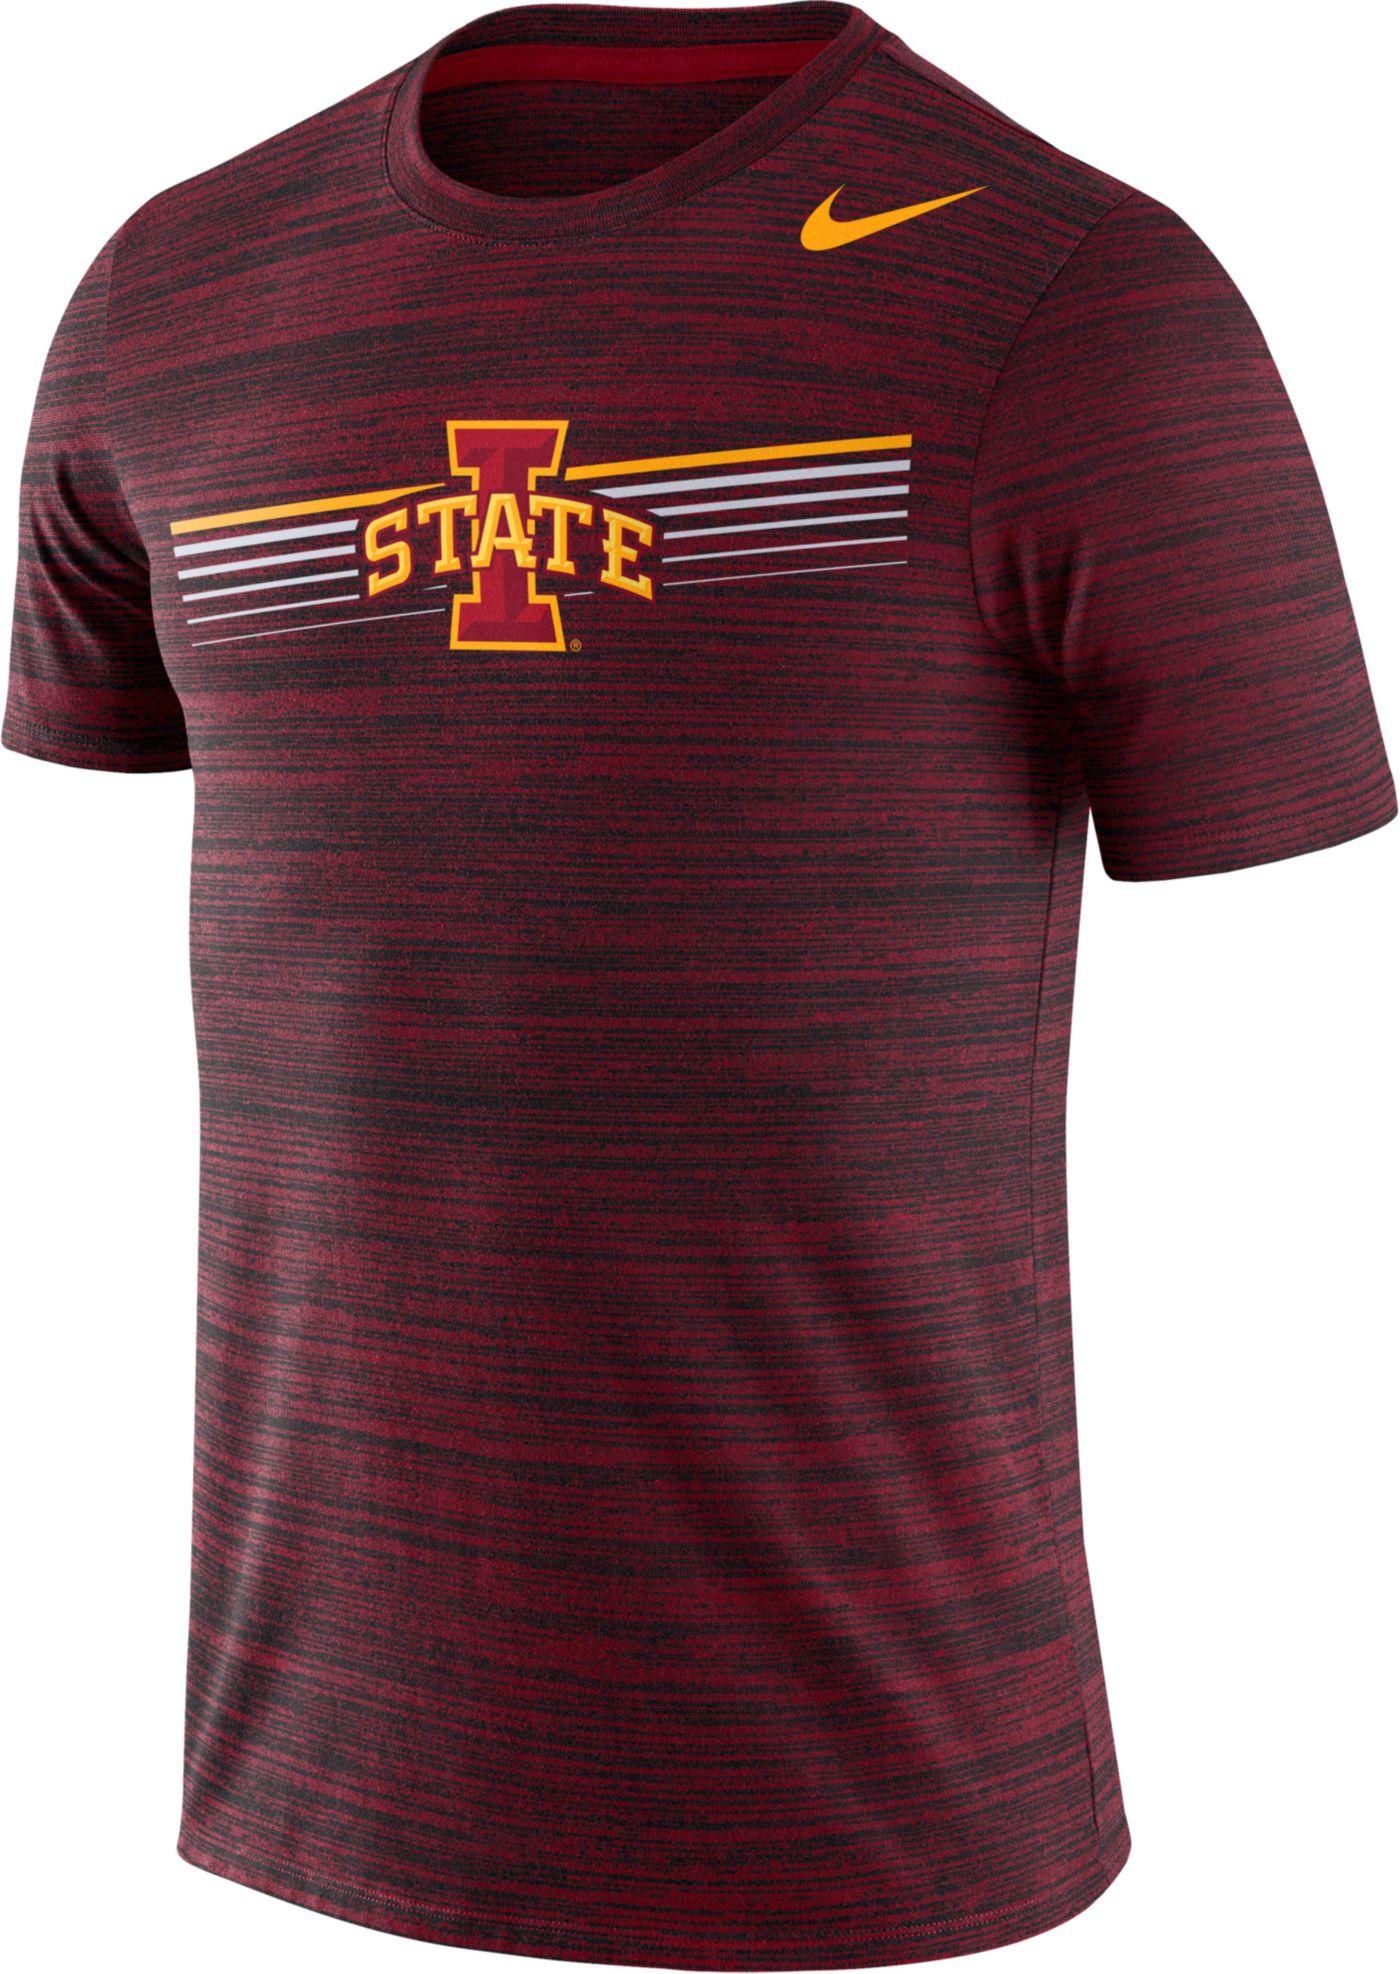 Nike Men's Iowa State Cyclones Cardinal Velocity Legend Graphic T-Shirt